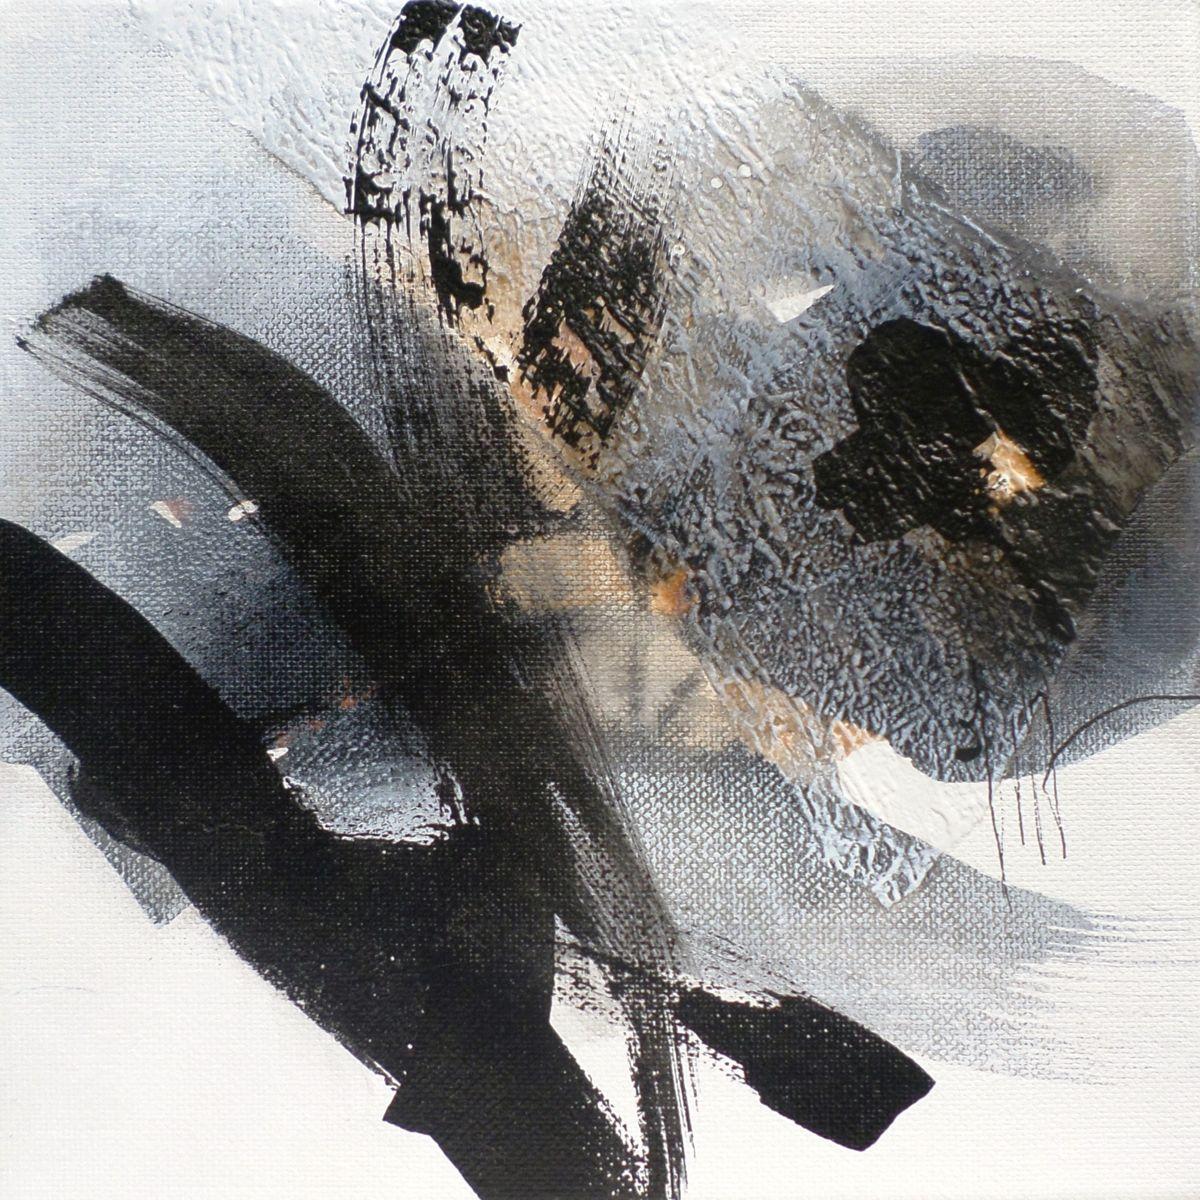 exposition, art, peinture, loiret, abstrait